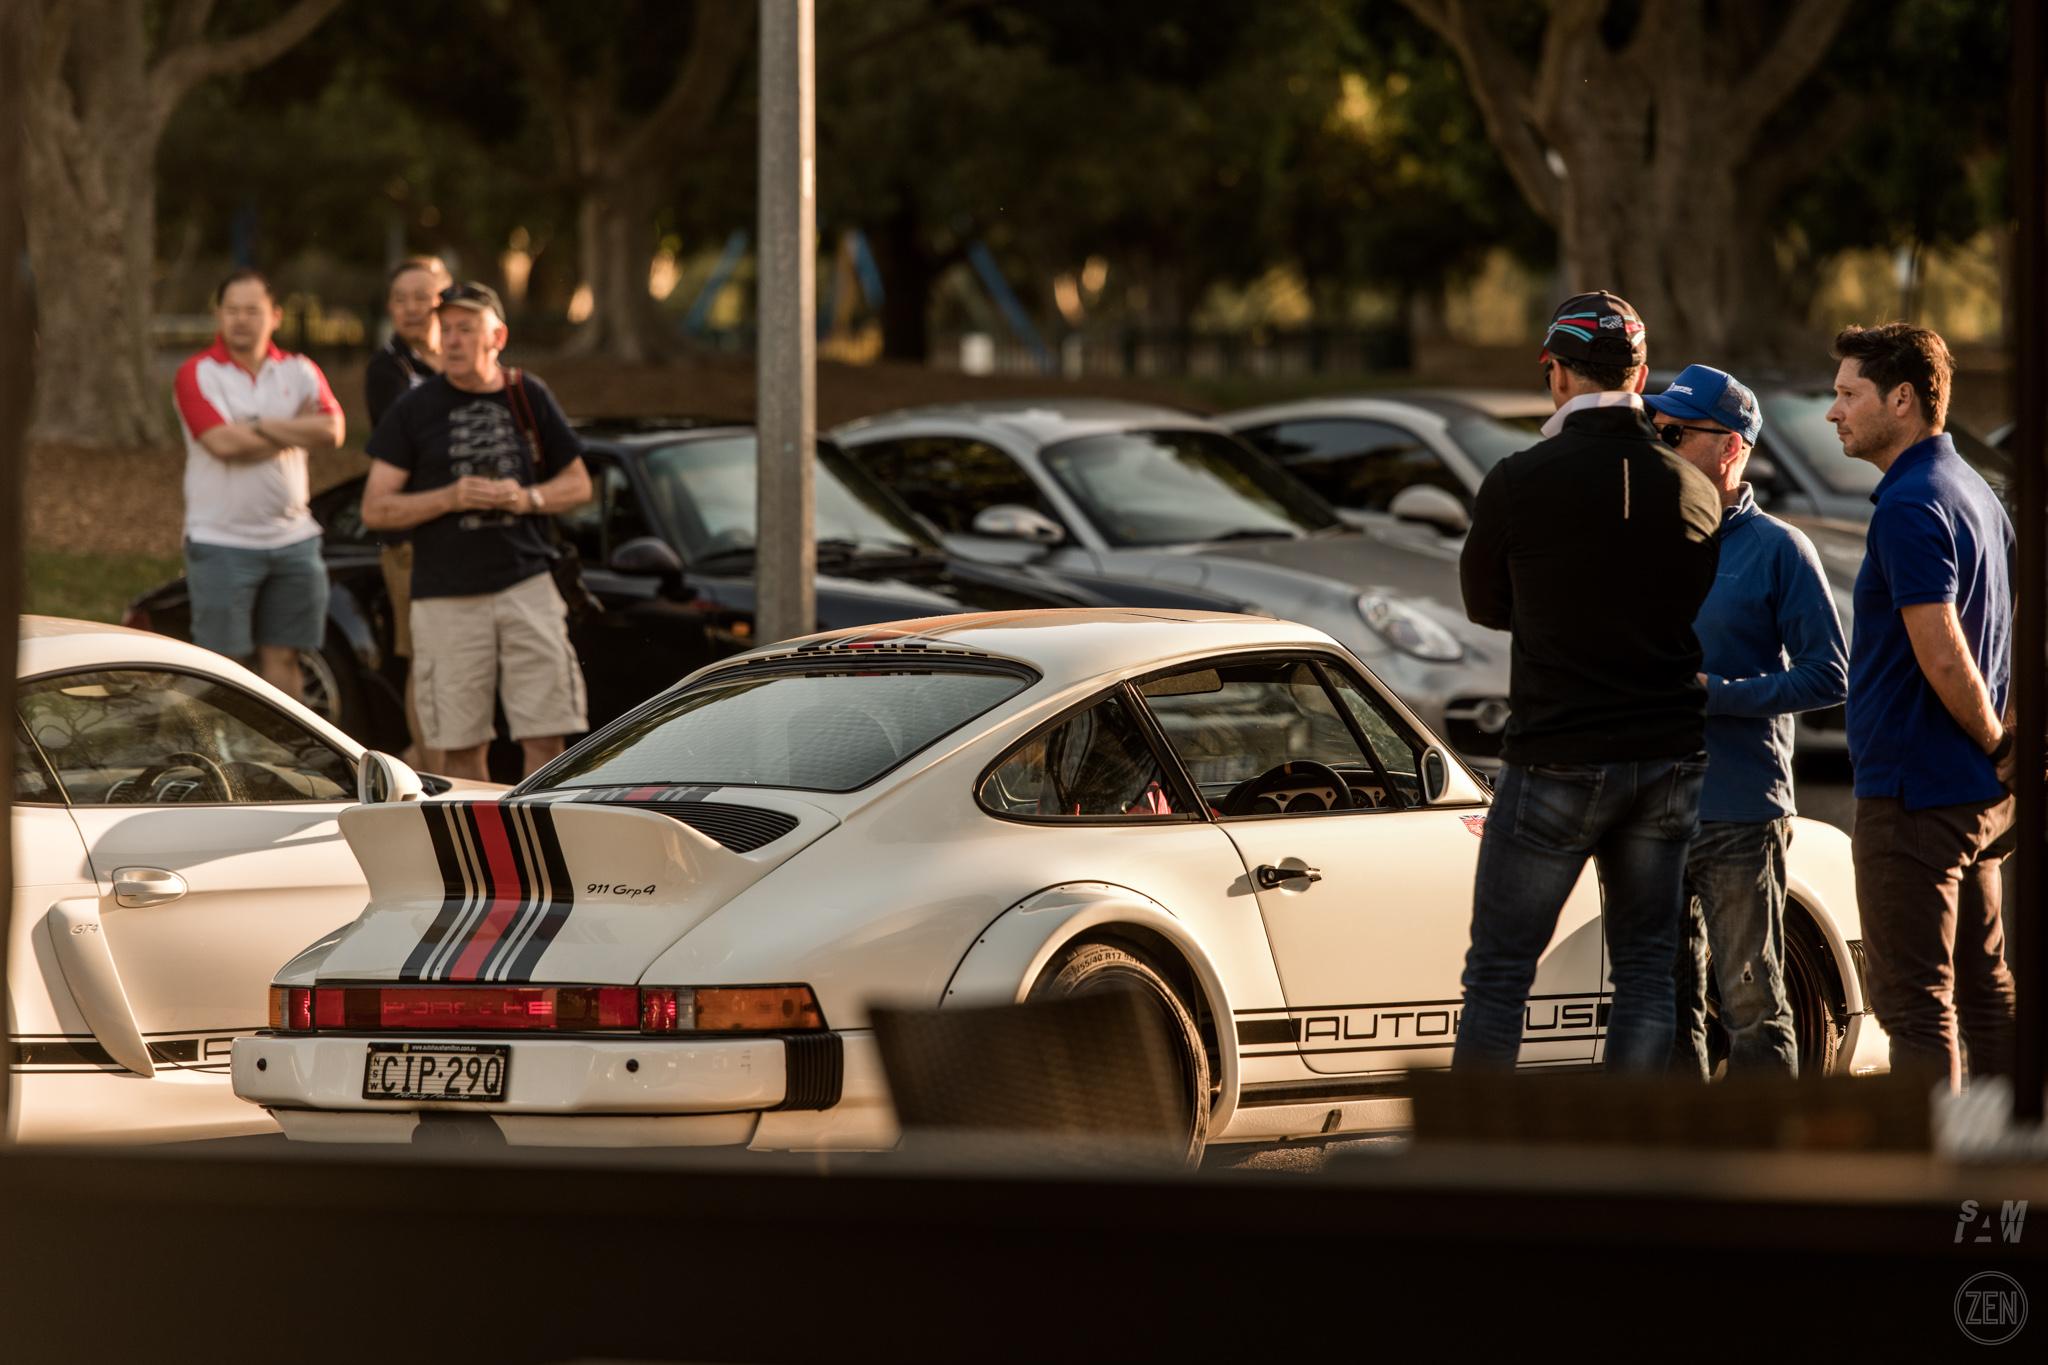 2019-10-27 - Autohaus Porsches & Coffee 040